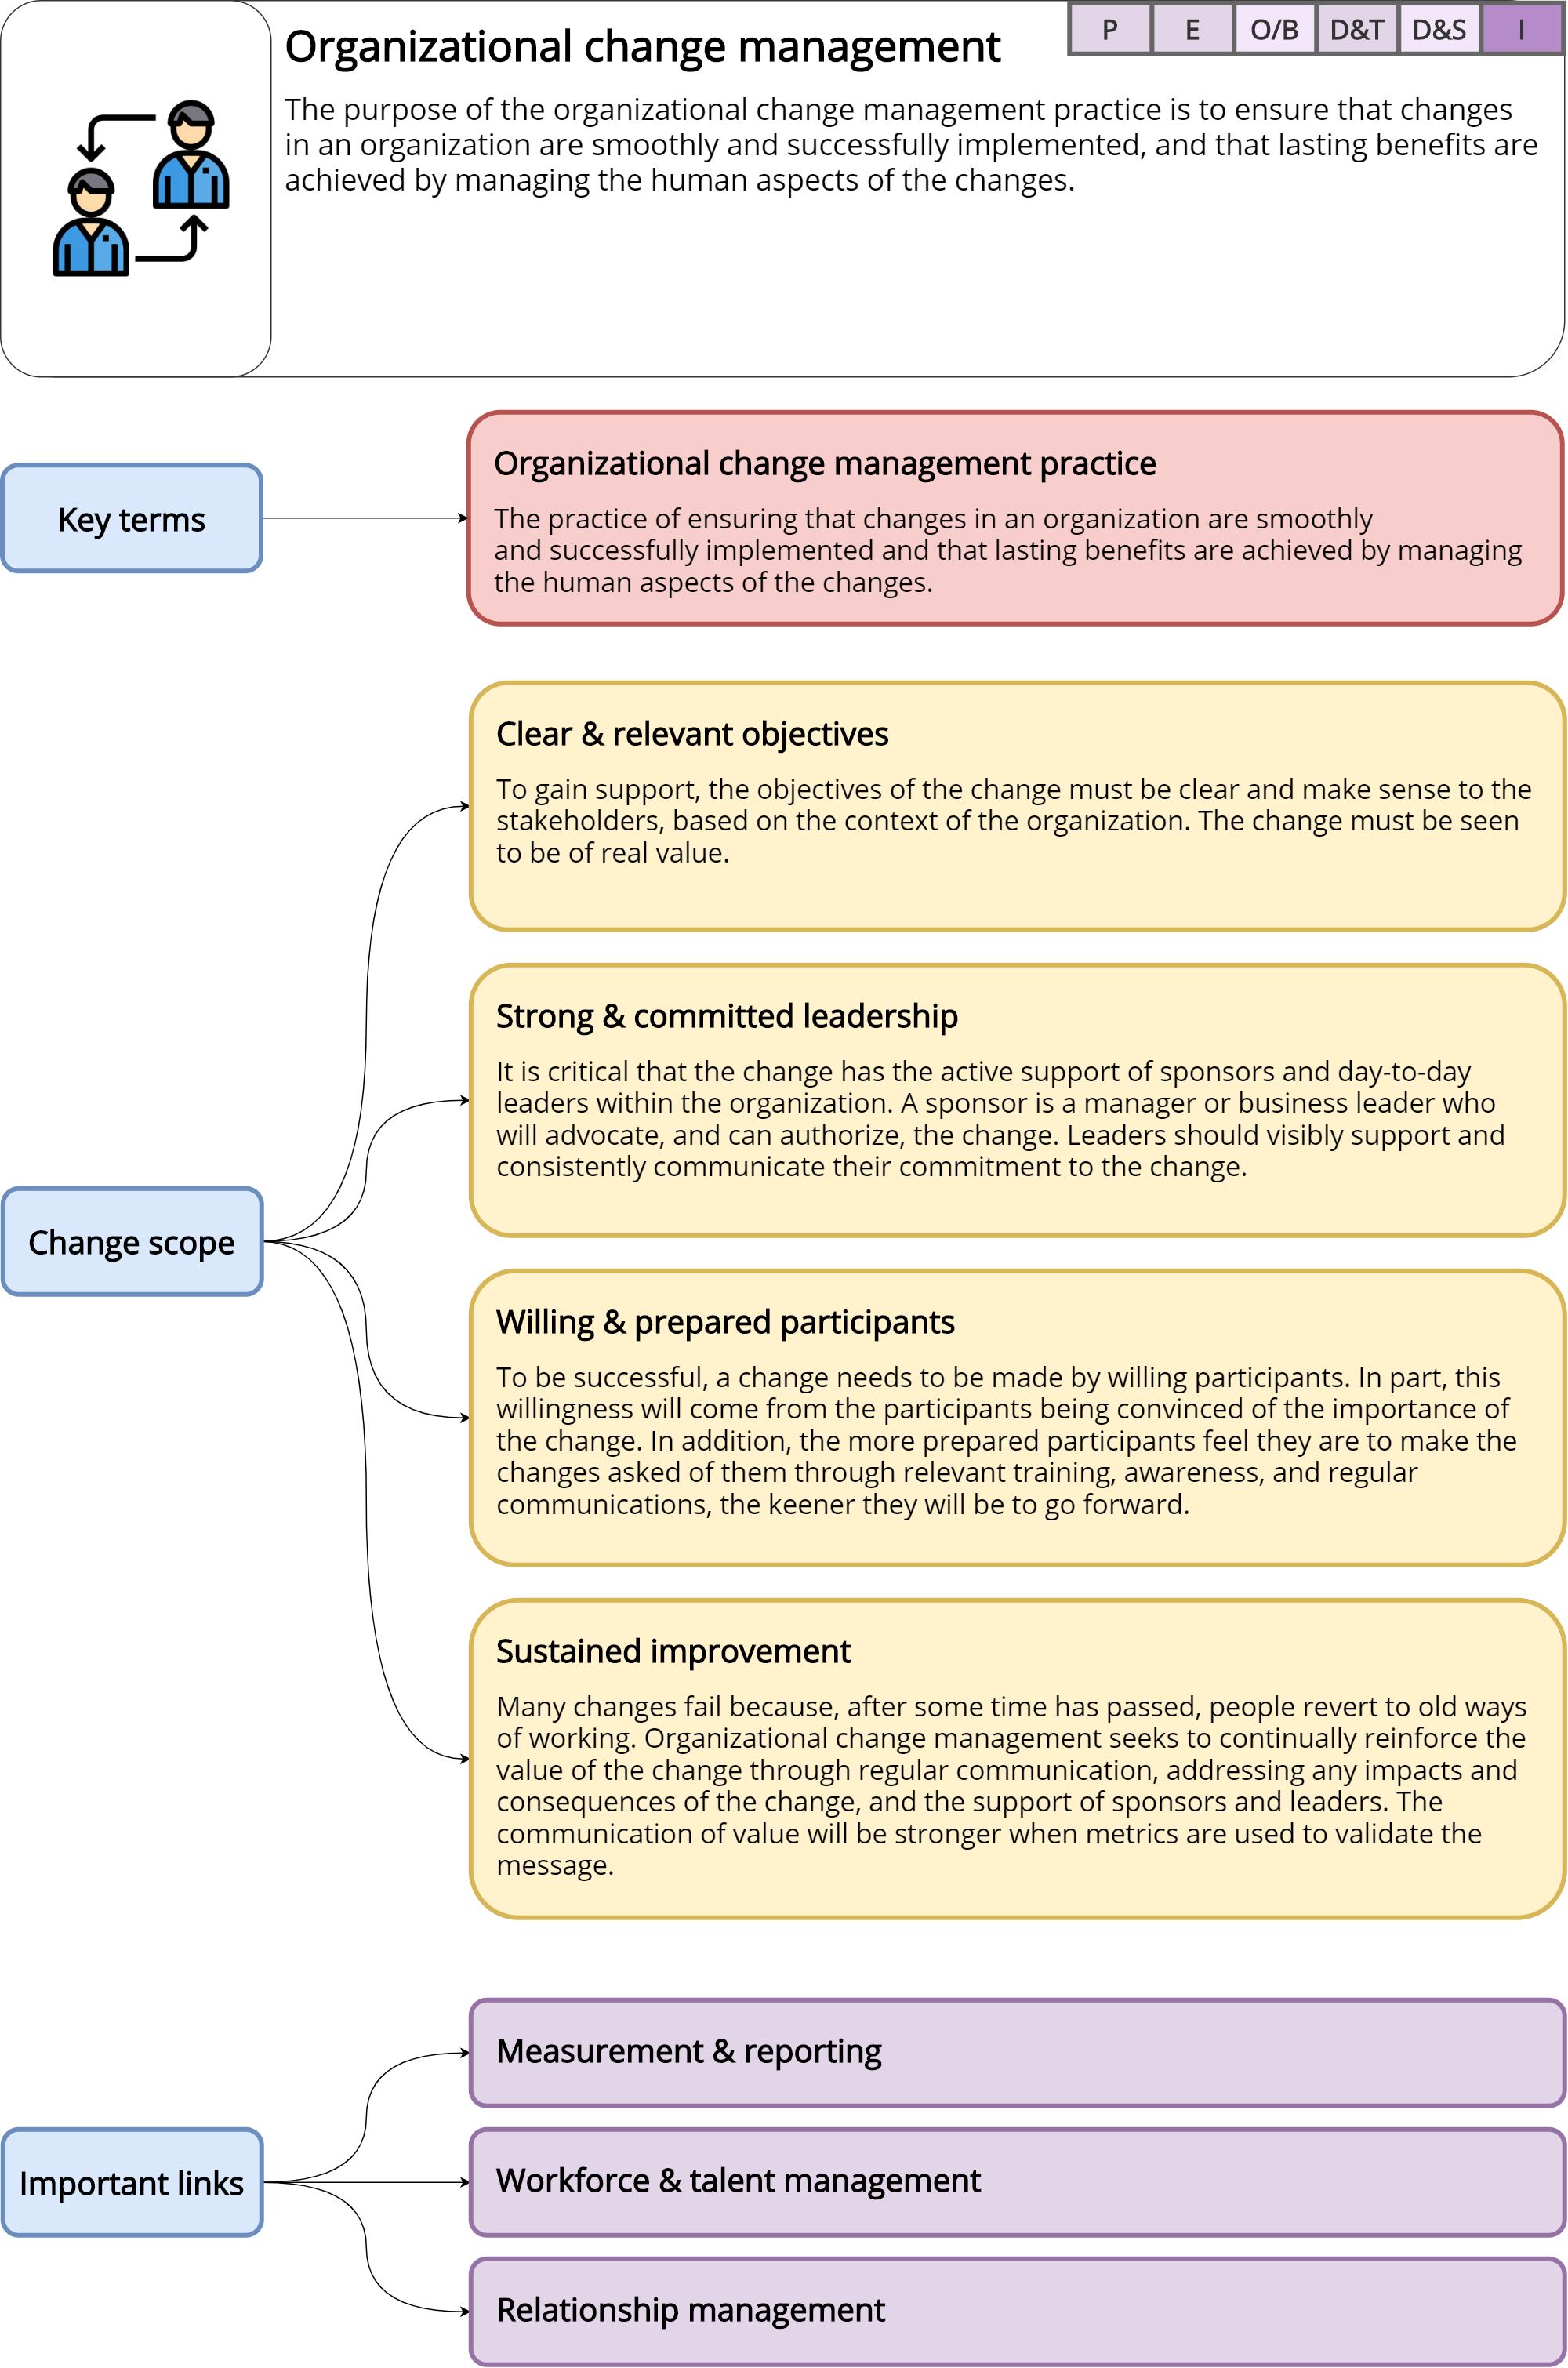 Organizational change management – ITILv4